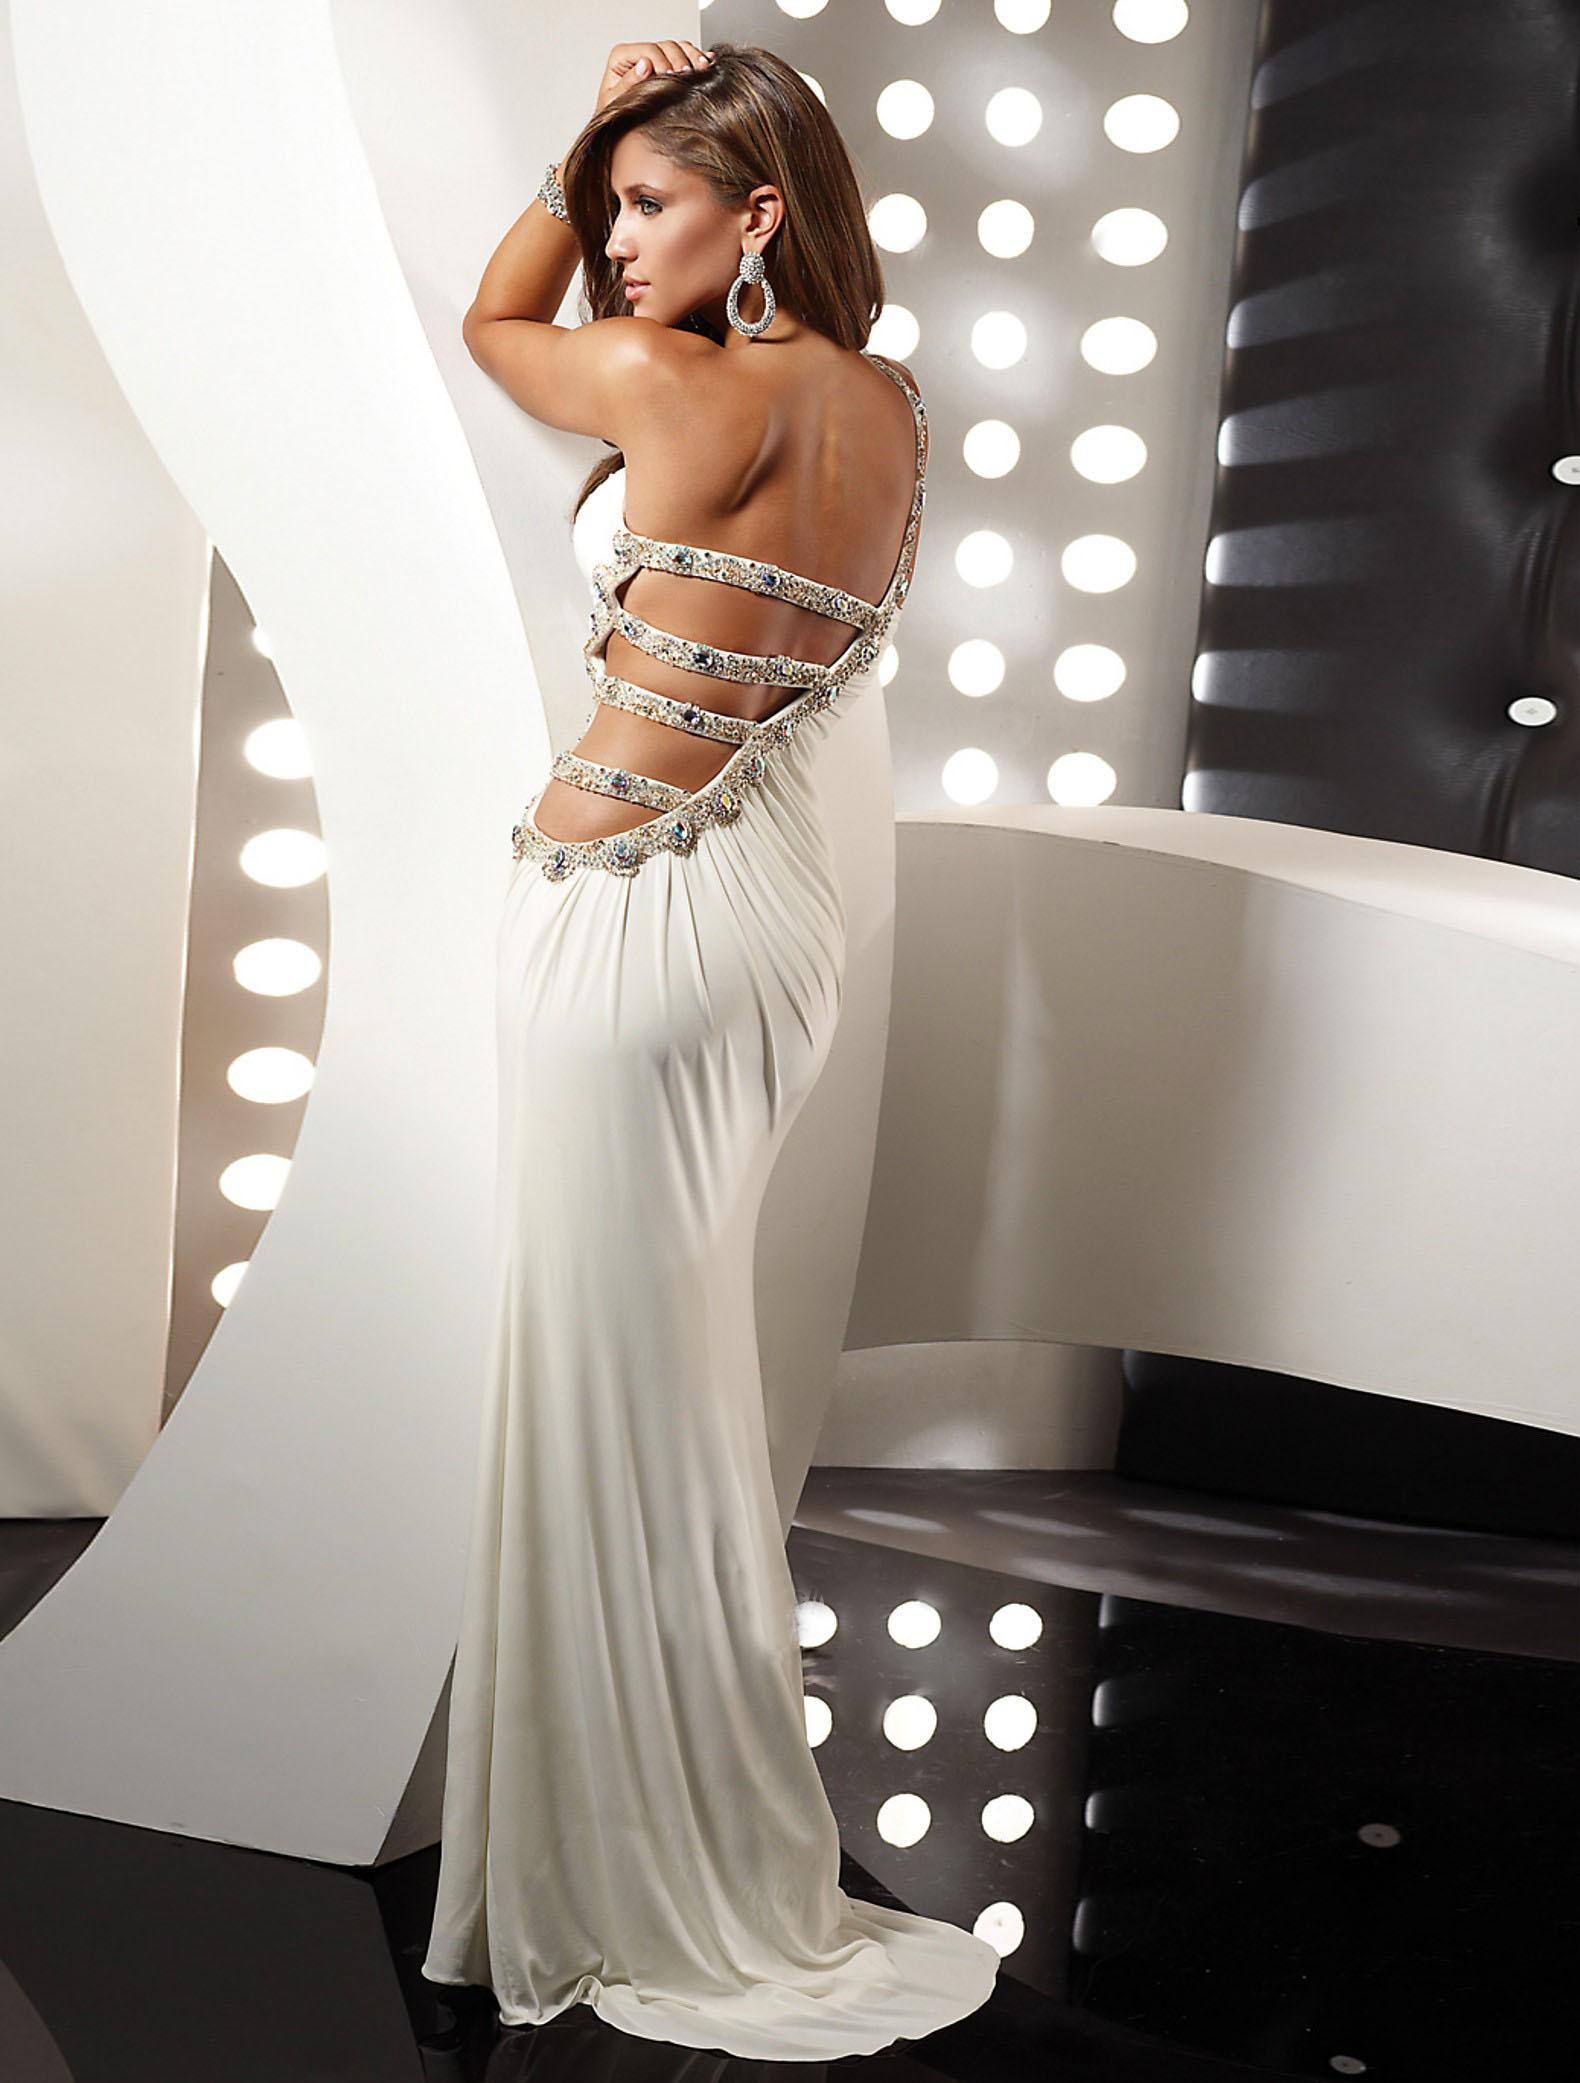 dress03sexy dresses